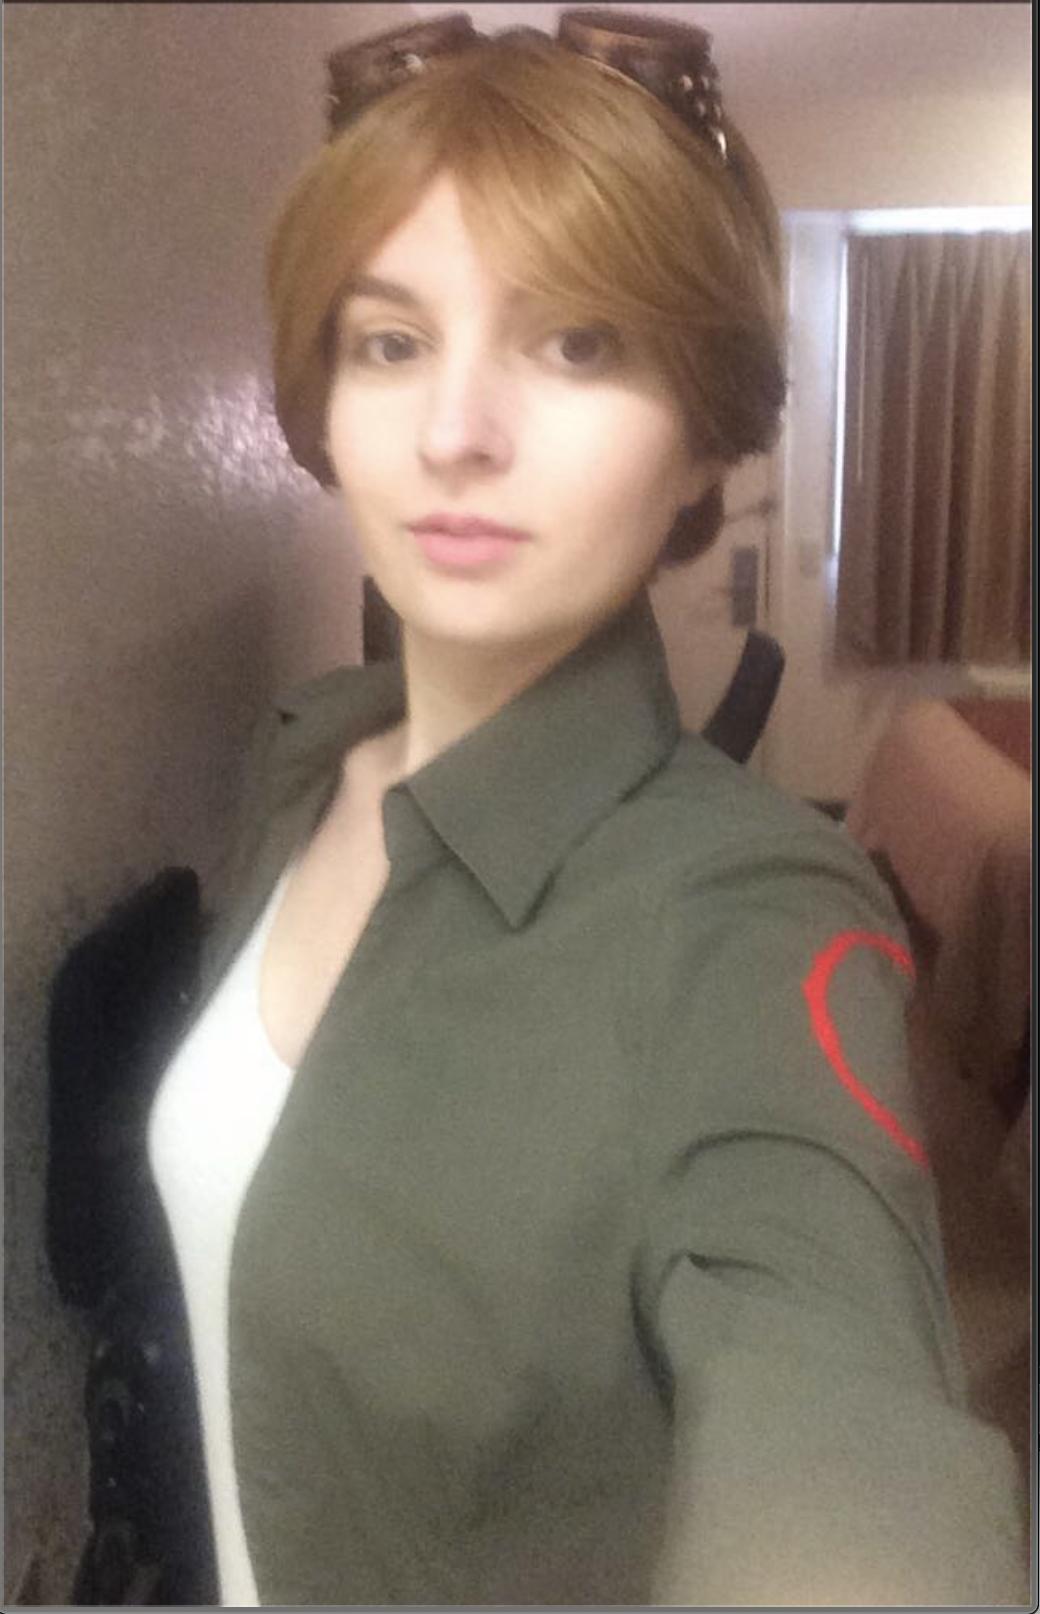 GenCon 2016 - Crista as Super Scientific Tachyon